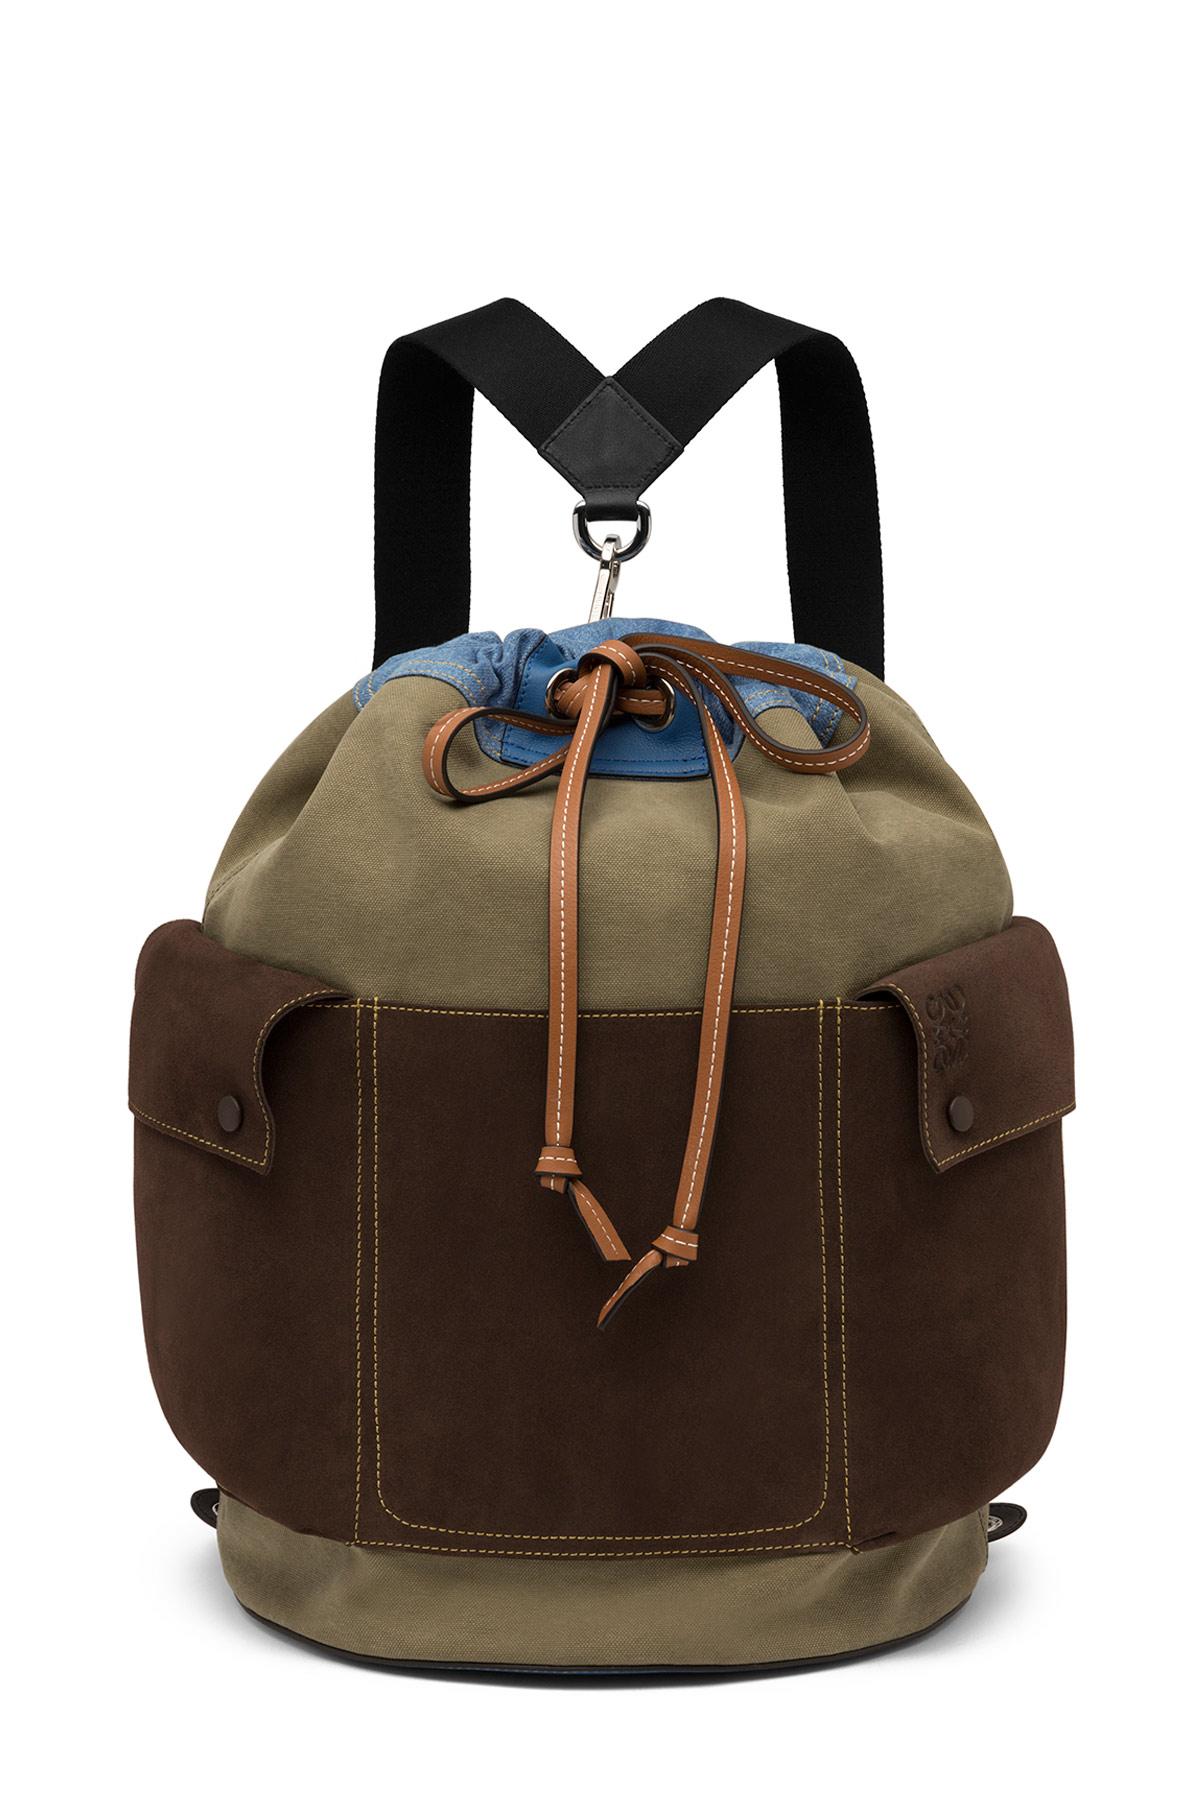 LOEWE Reversible Backpack Khaki Gr/Choc Brown/Blue Denim front